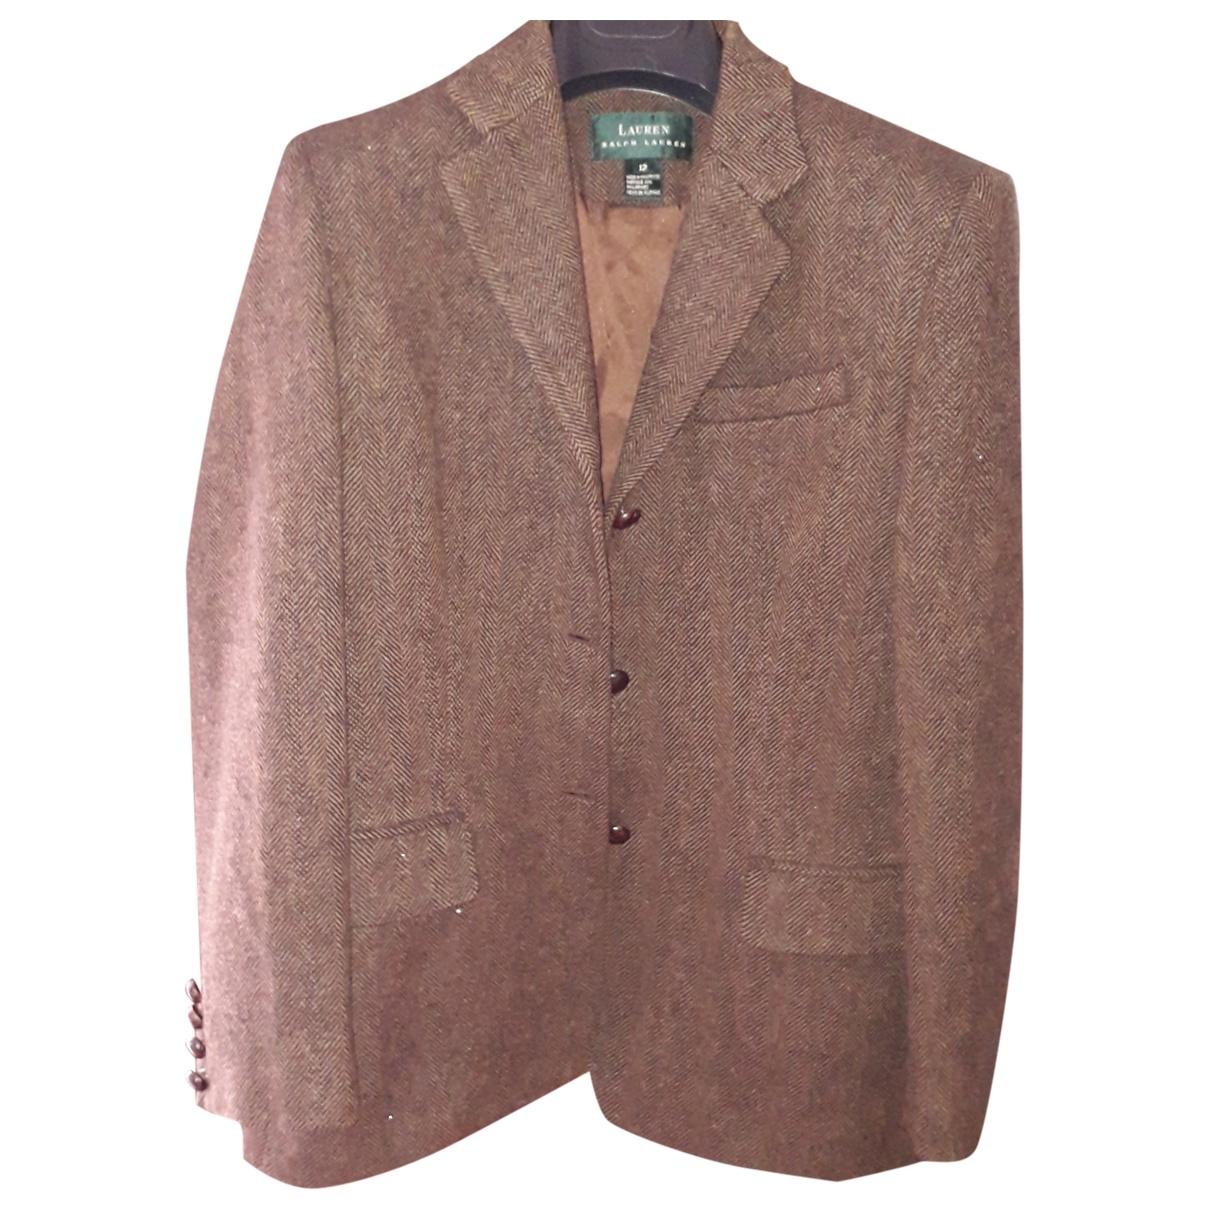 Lauren Ralph Lauren - Veste   pour femme en laine - marron